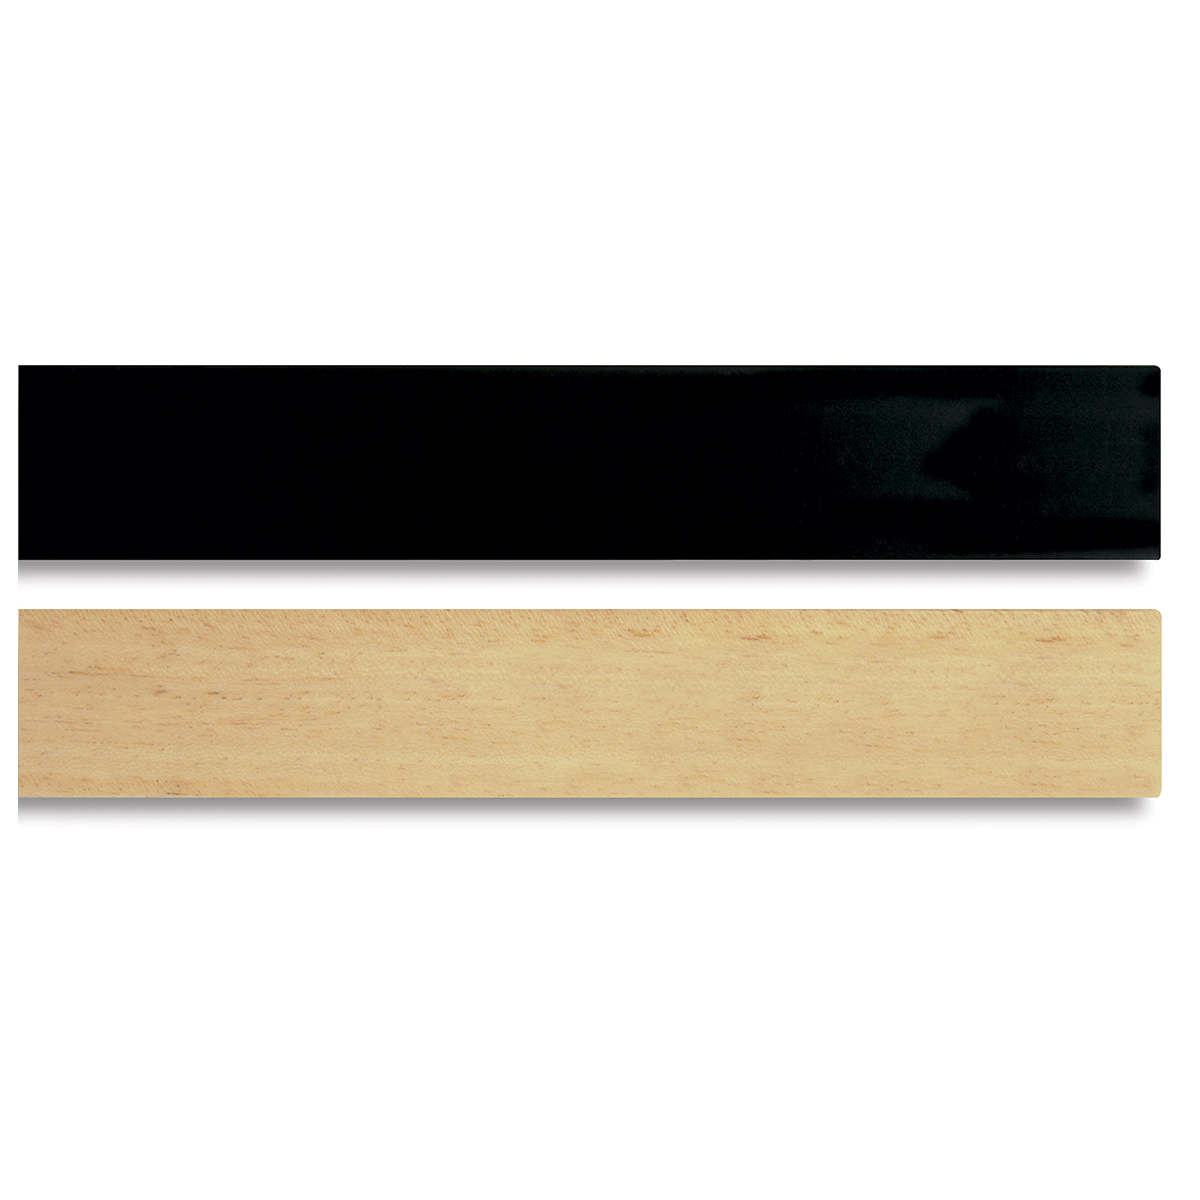 Nielsen Bainbridge Ayous Wood Frame